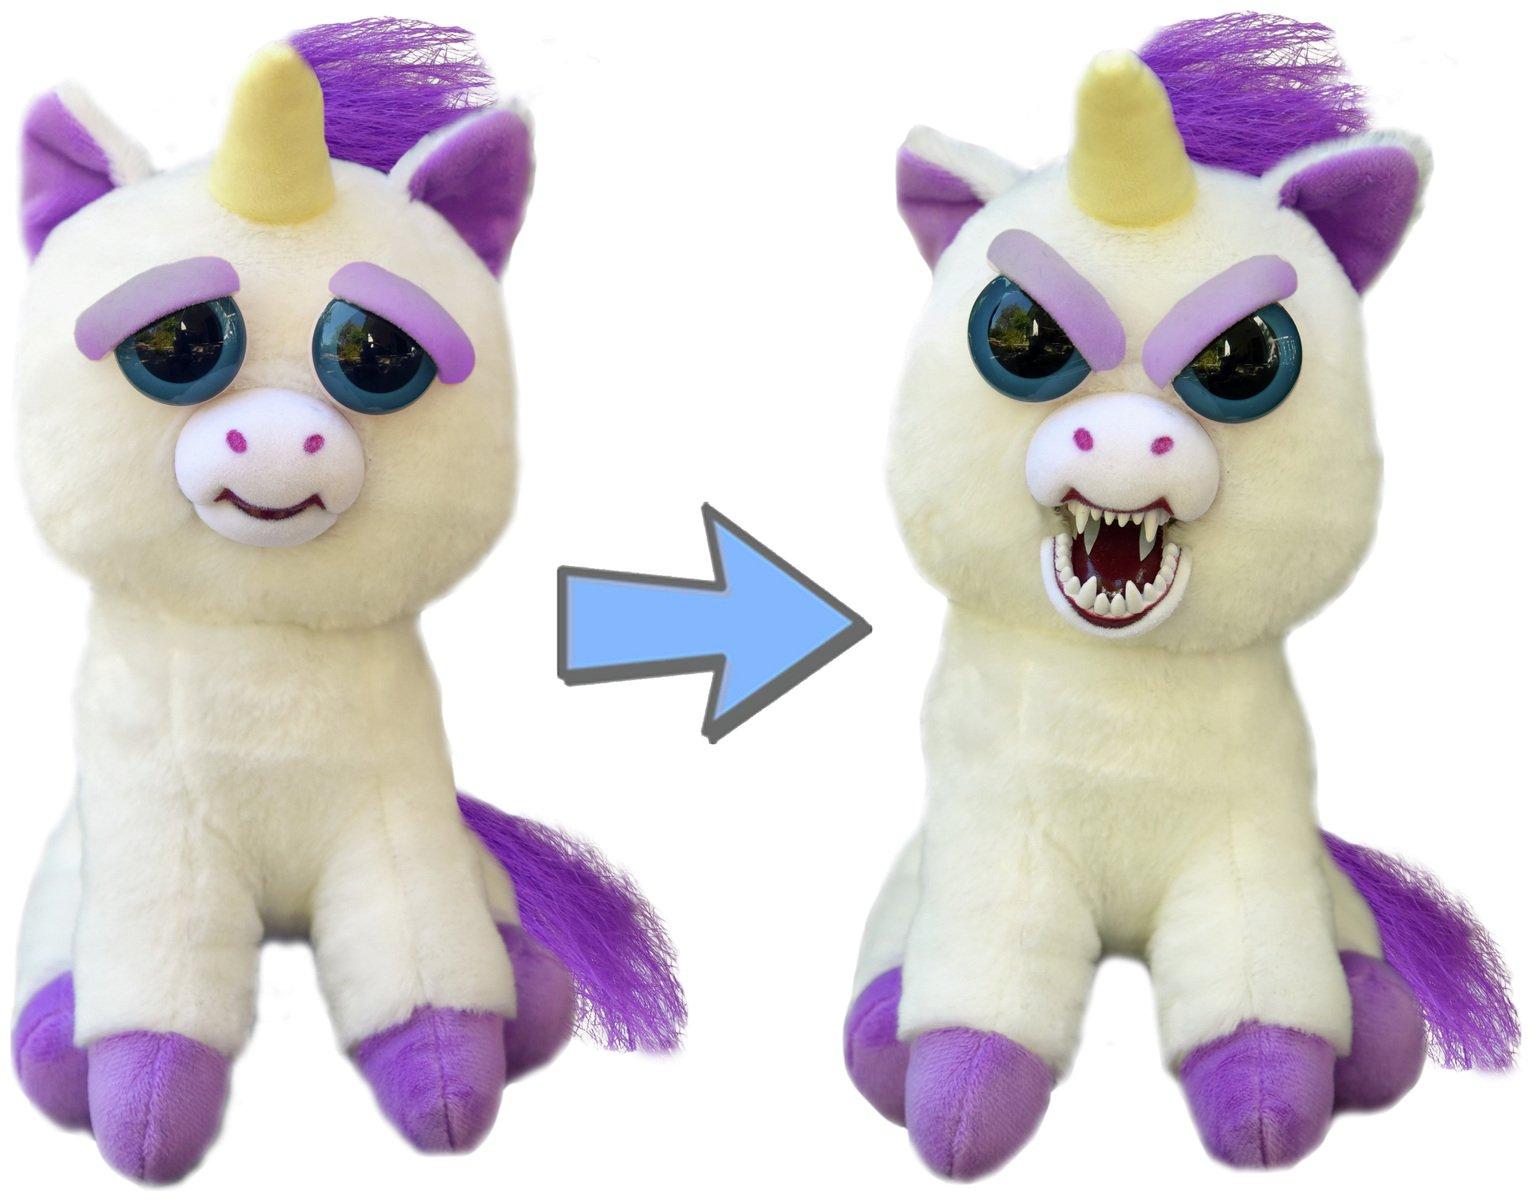 Image of Feisty Pets Glenda Glitterpoop Unicorn Soft Toy.